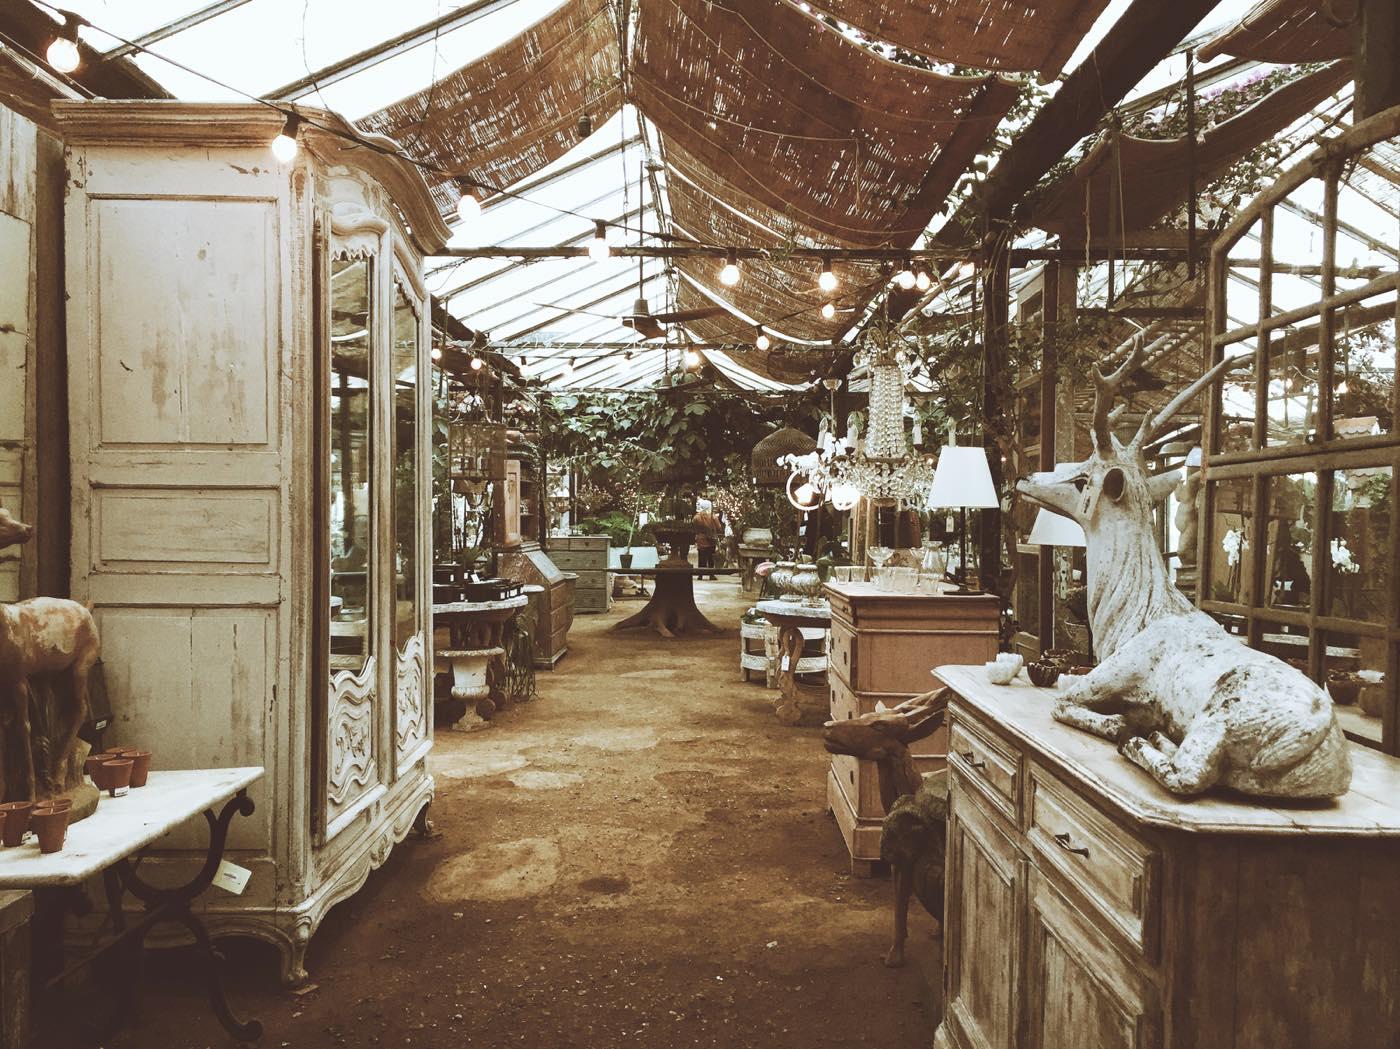 my-wanderlust-notes-nel-verde-del-parco-di-richmond-petersham-nurseries